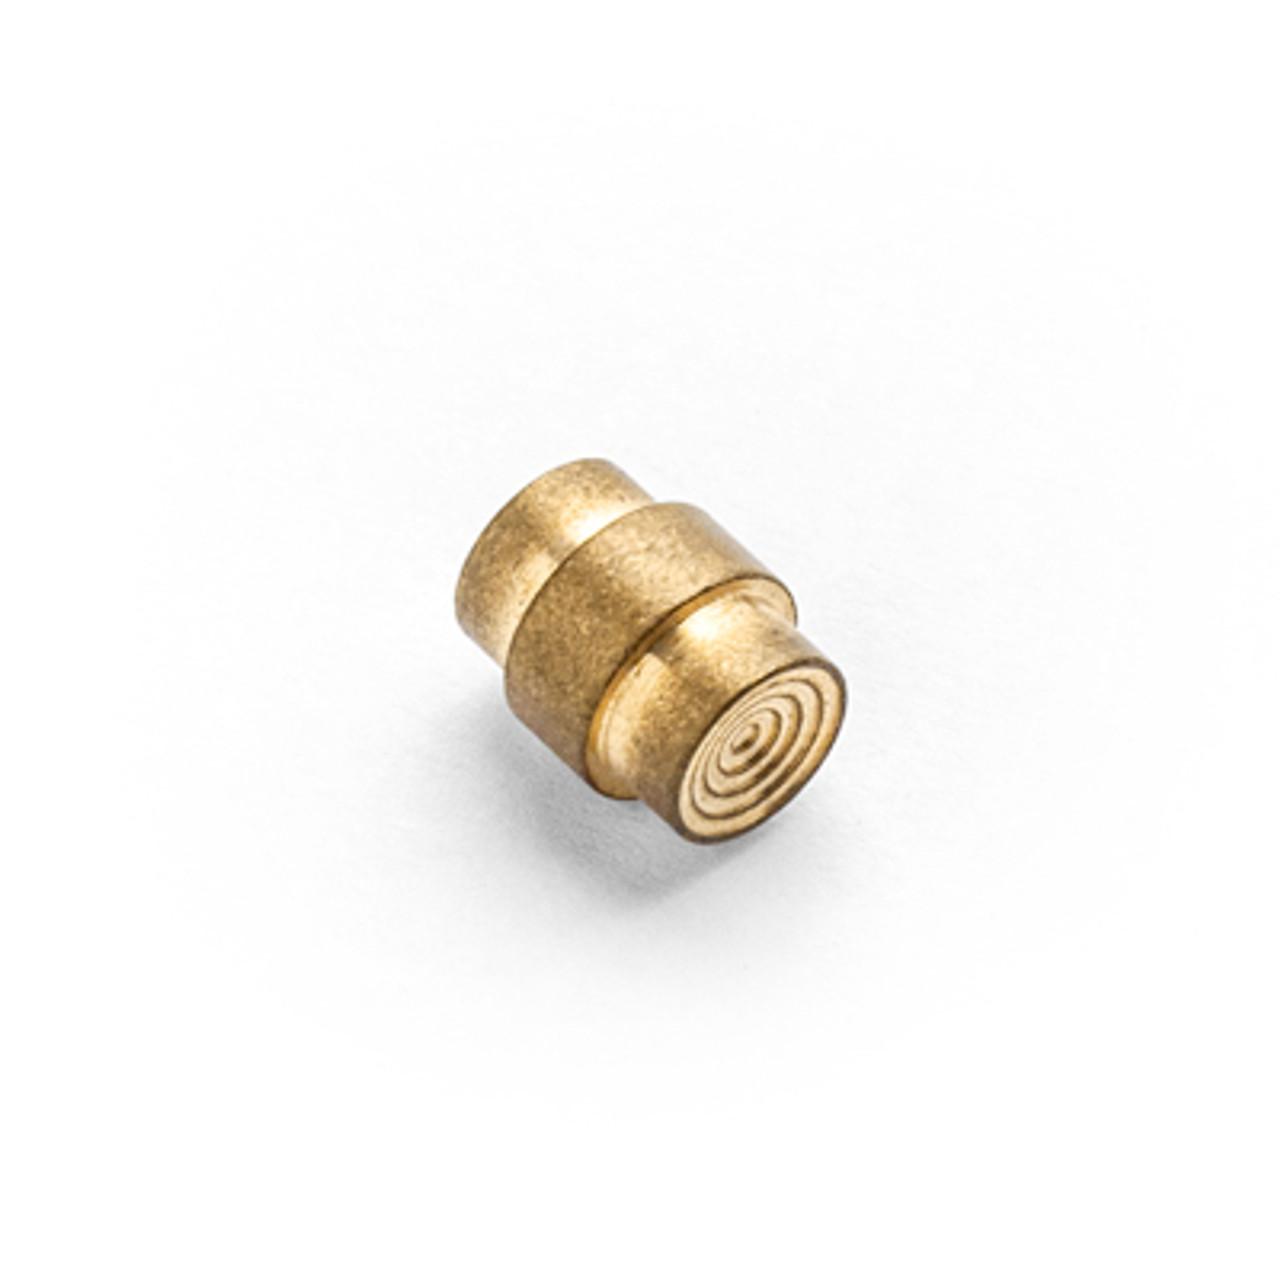 Flytanium Brass Stepped Lanyard Hole Stopper for Spyderco Paramilitary 2 / Para3